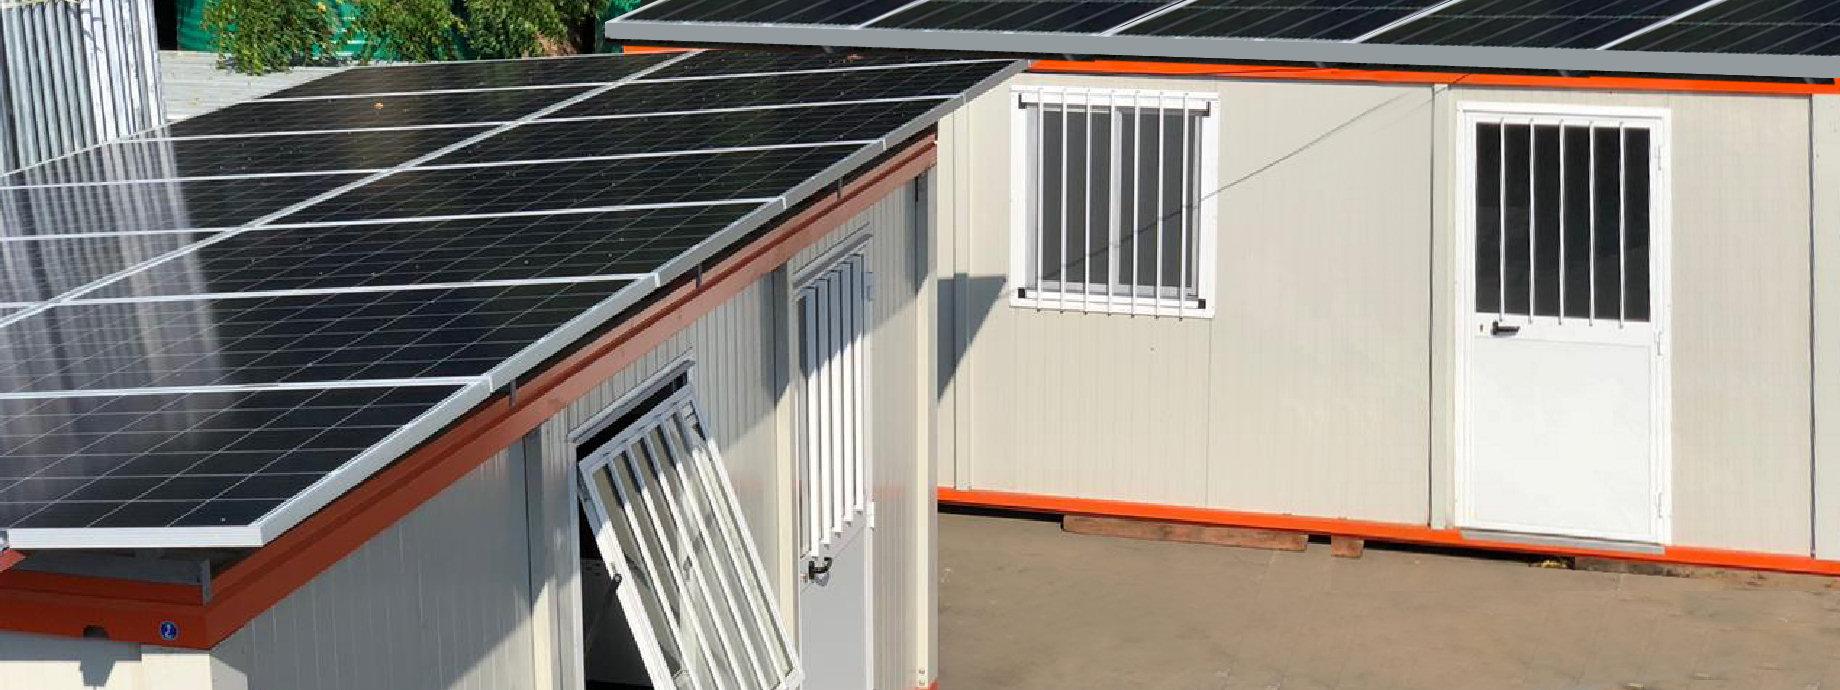 fotovoltaico-new2